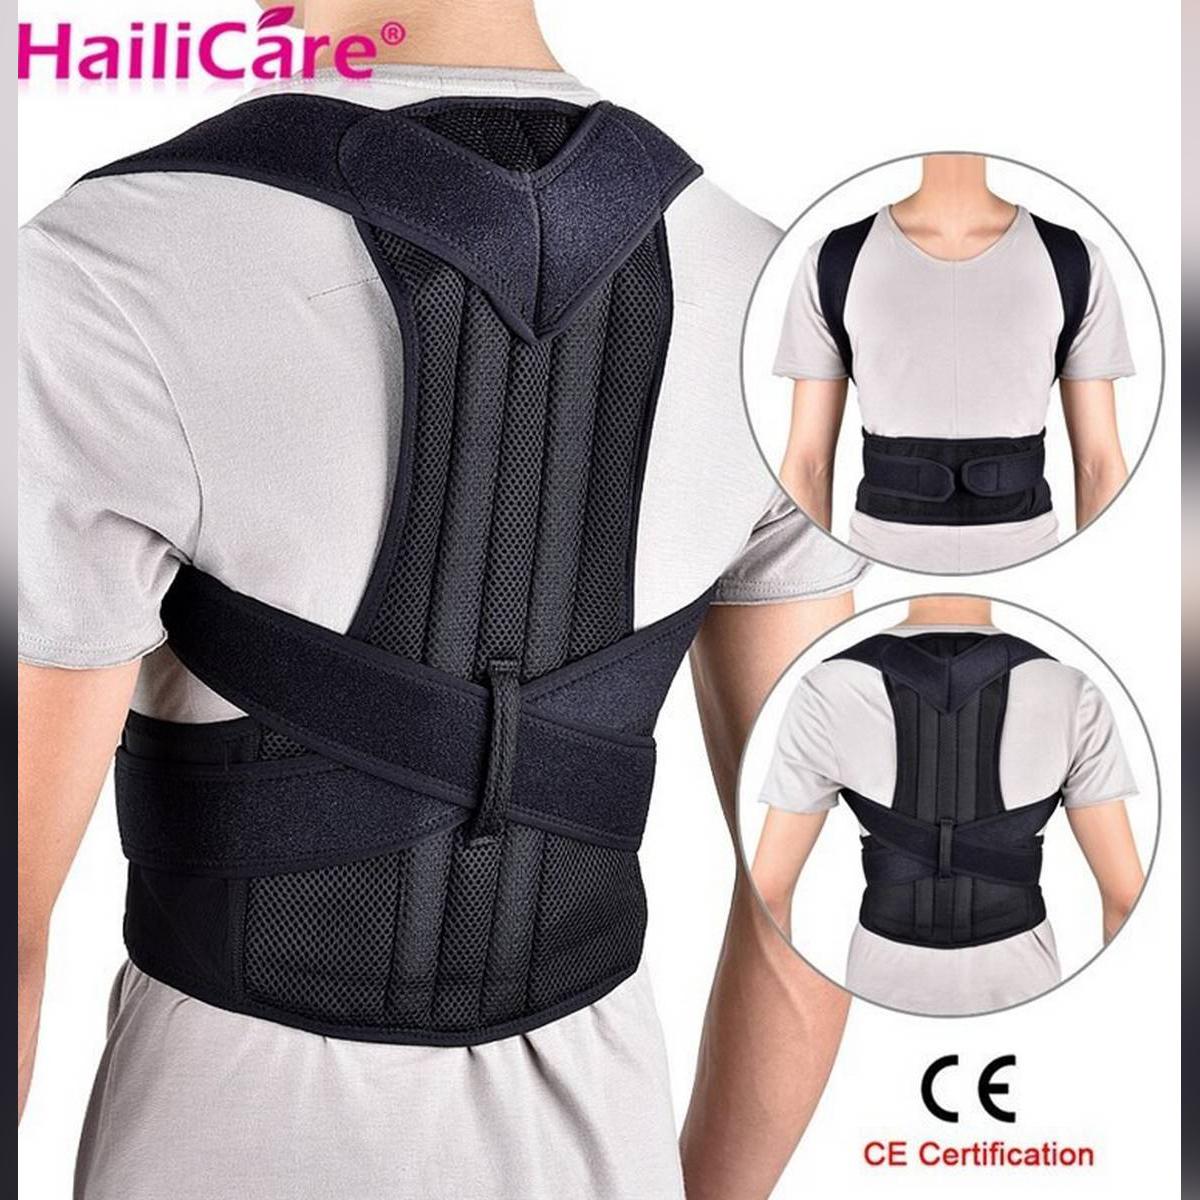 Posture Corrector for Women Men - Back Brace and Shoulder Support Trainer for Pain Relief & Improve Bad Slouching Problems - Fully Adjustable Clavicle Medical Belt Straightener